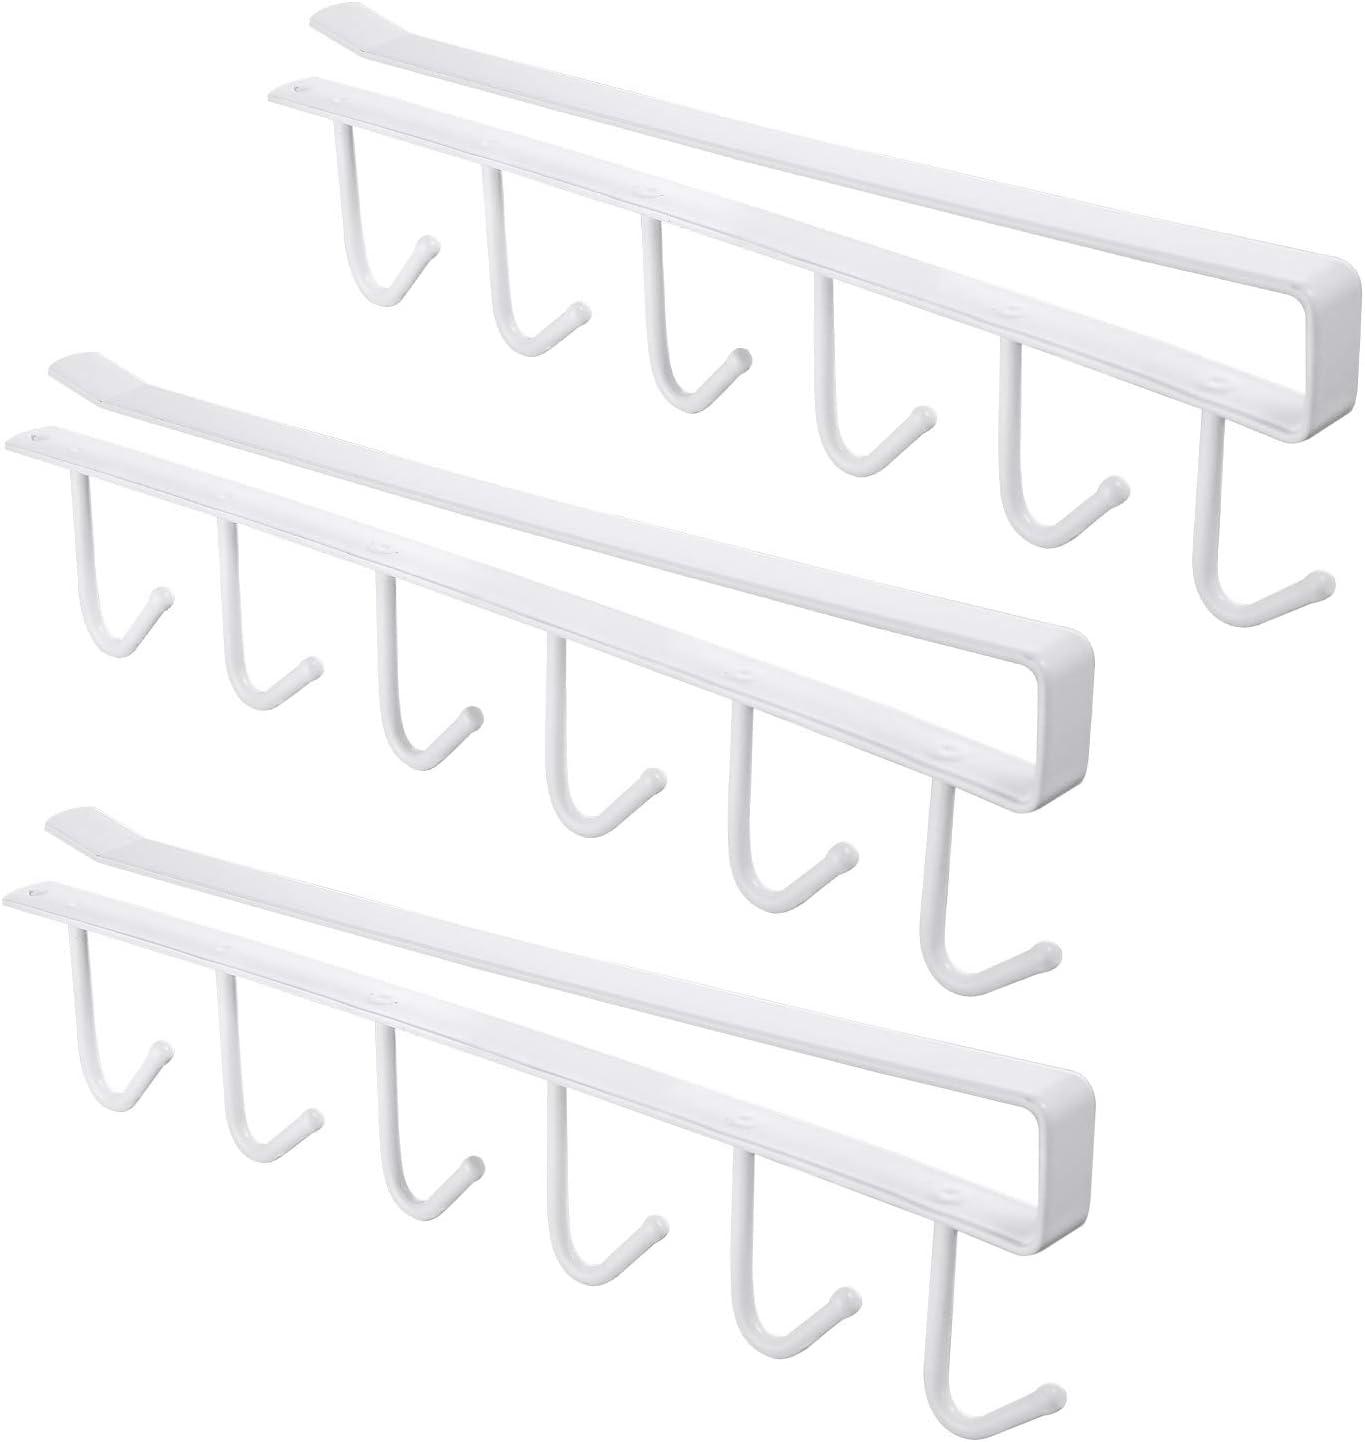 3pcs Mug Hooks Under Cabinet Mug Holder Rack, Drilling Free Coffee Cups Holder Hanger for Cups/Kitchen Utensils/Ties Belts/Scarf/Keys Storage, Fit for 0.8inch Thickness Shelf or Less (White)